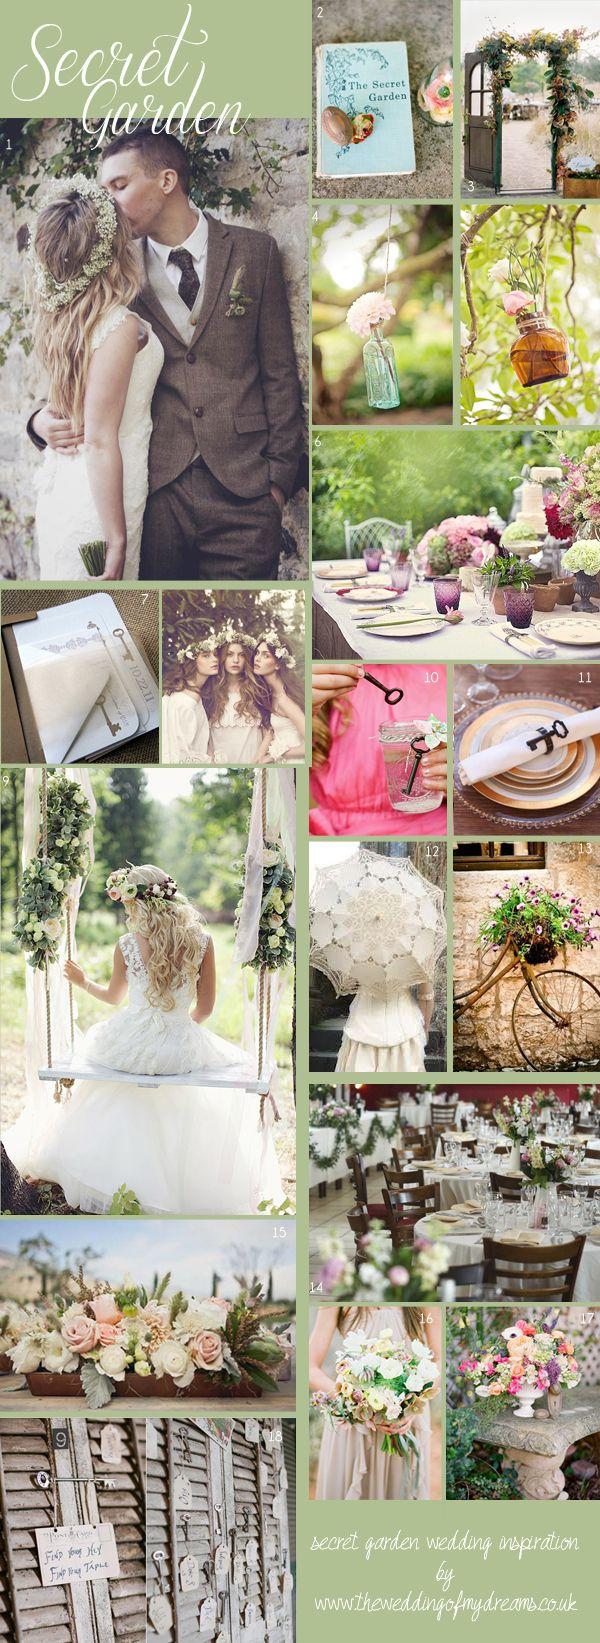 Secret Garden Theme: Secret Garden Wedding Decorations & Inspiration